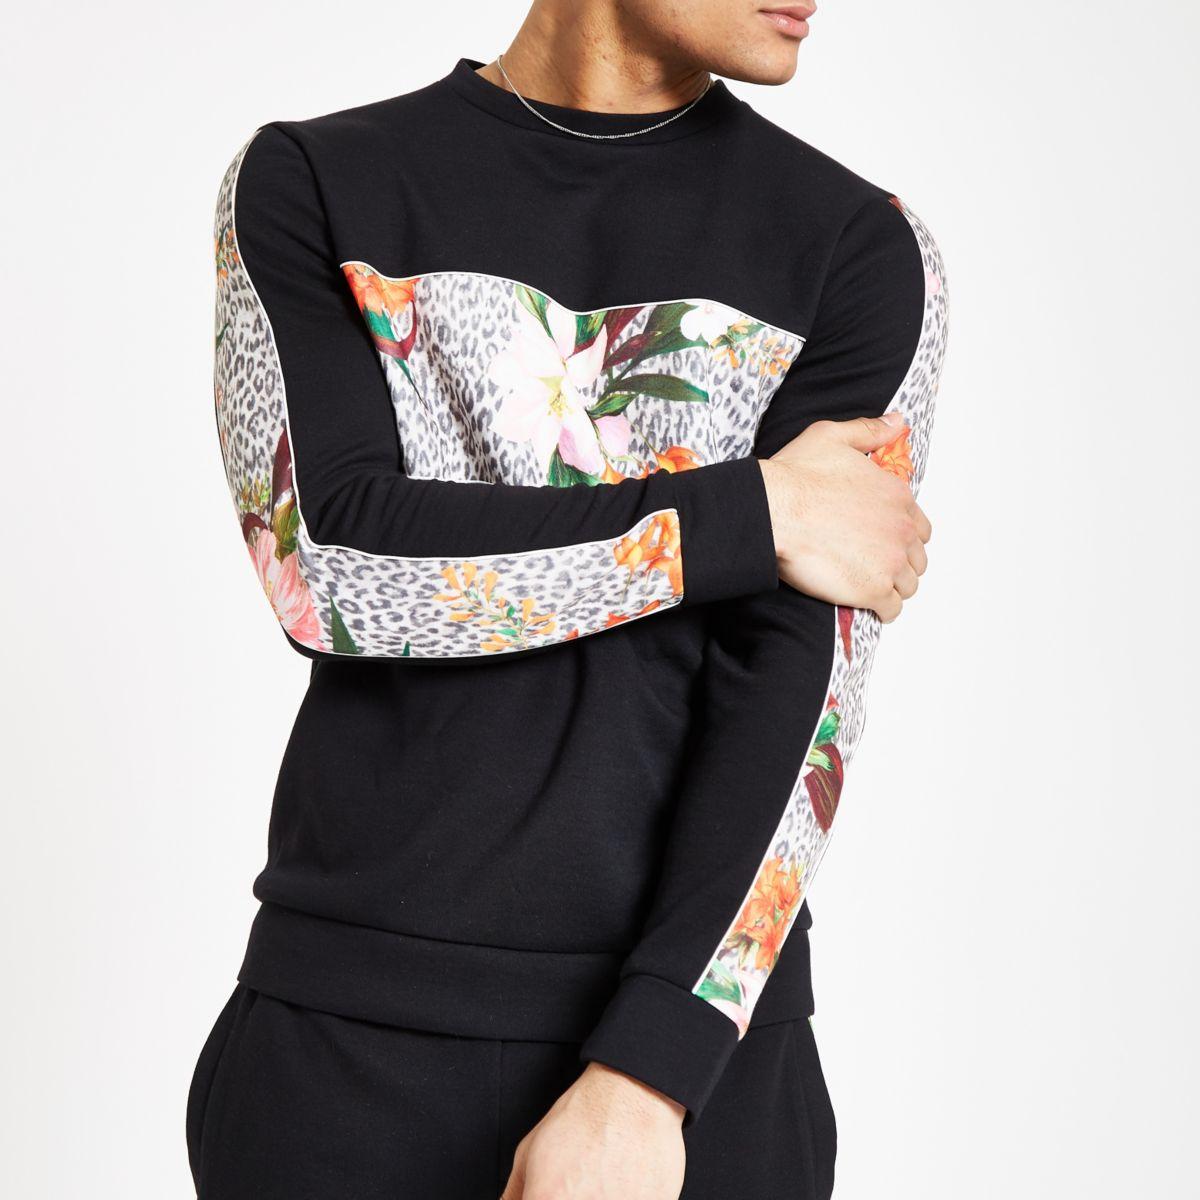 Black leopard floral slim fit sweatshirt